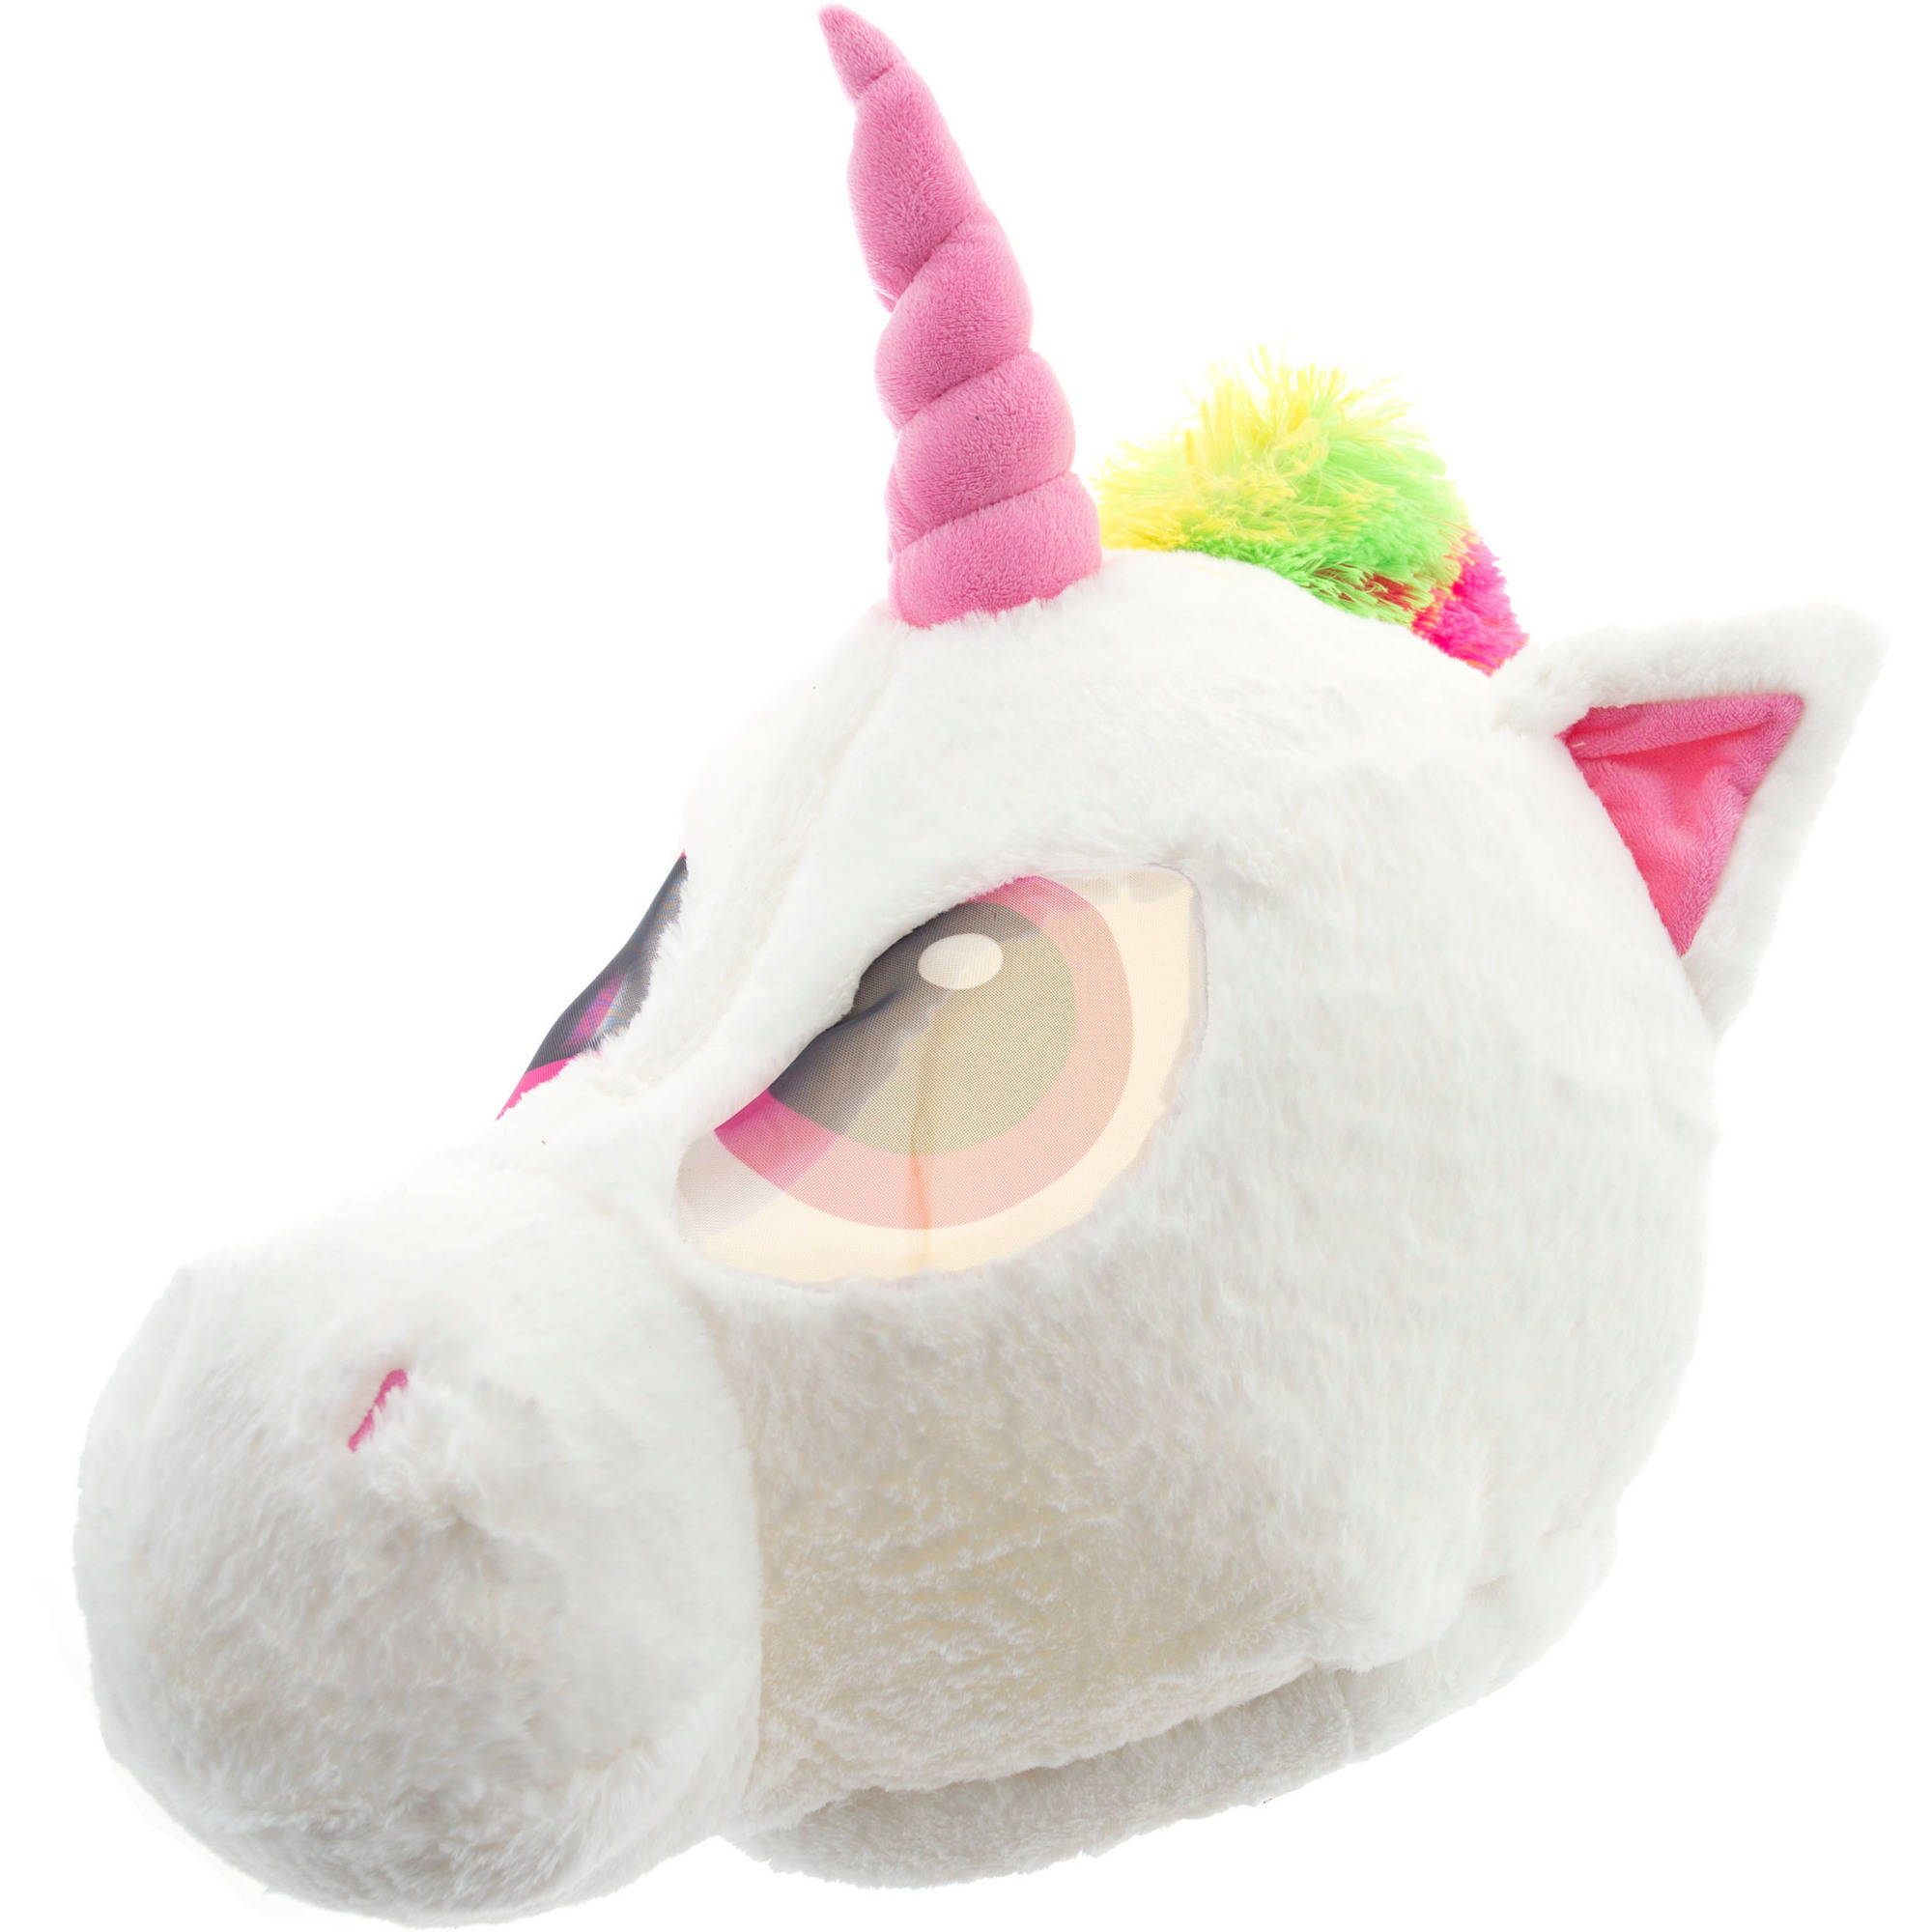 Unicorn Maskimal Adorable Large Plush Head Mask Accessory Walmart Com